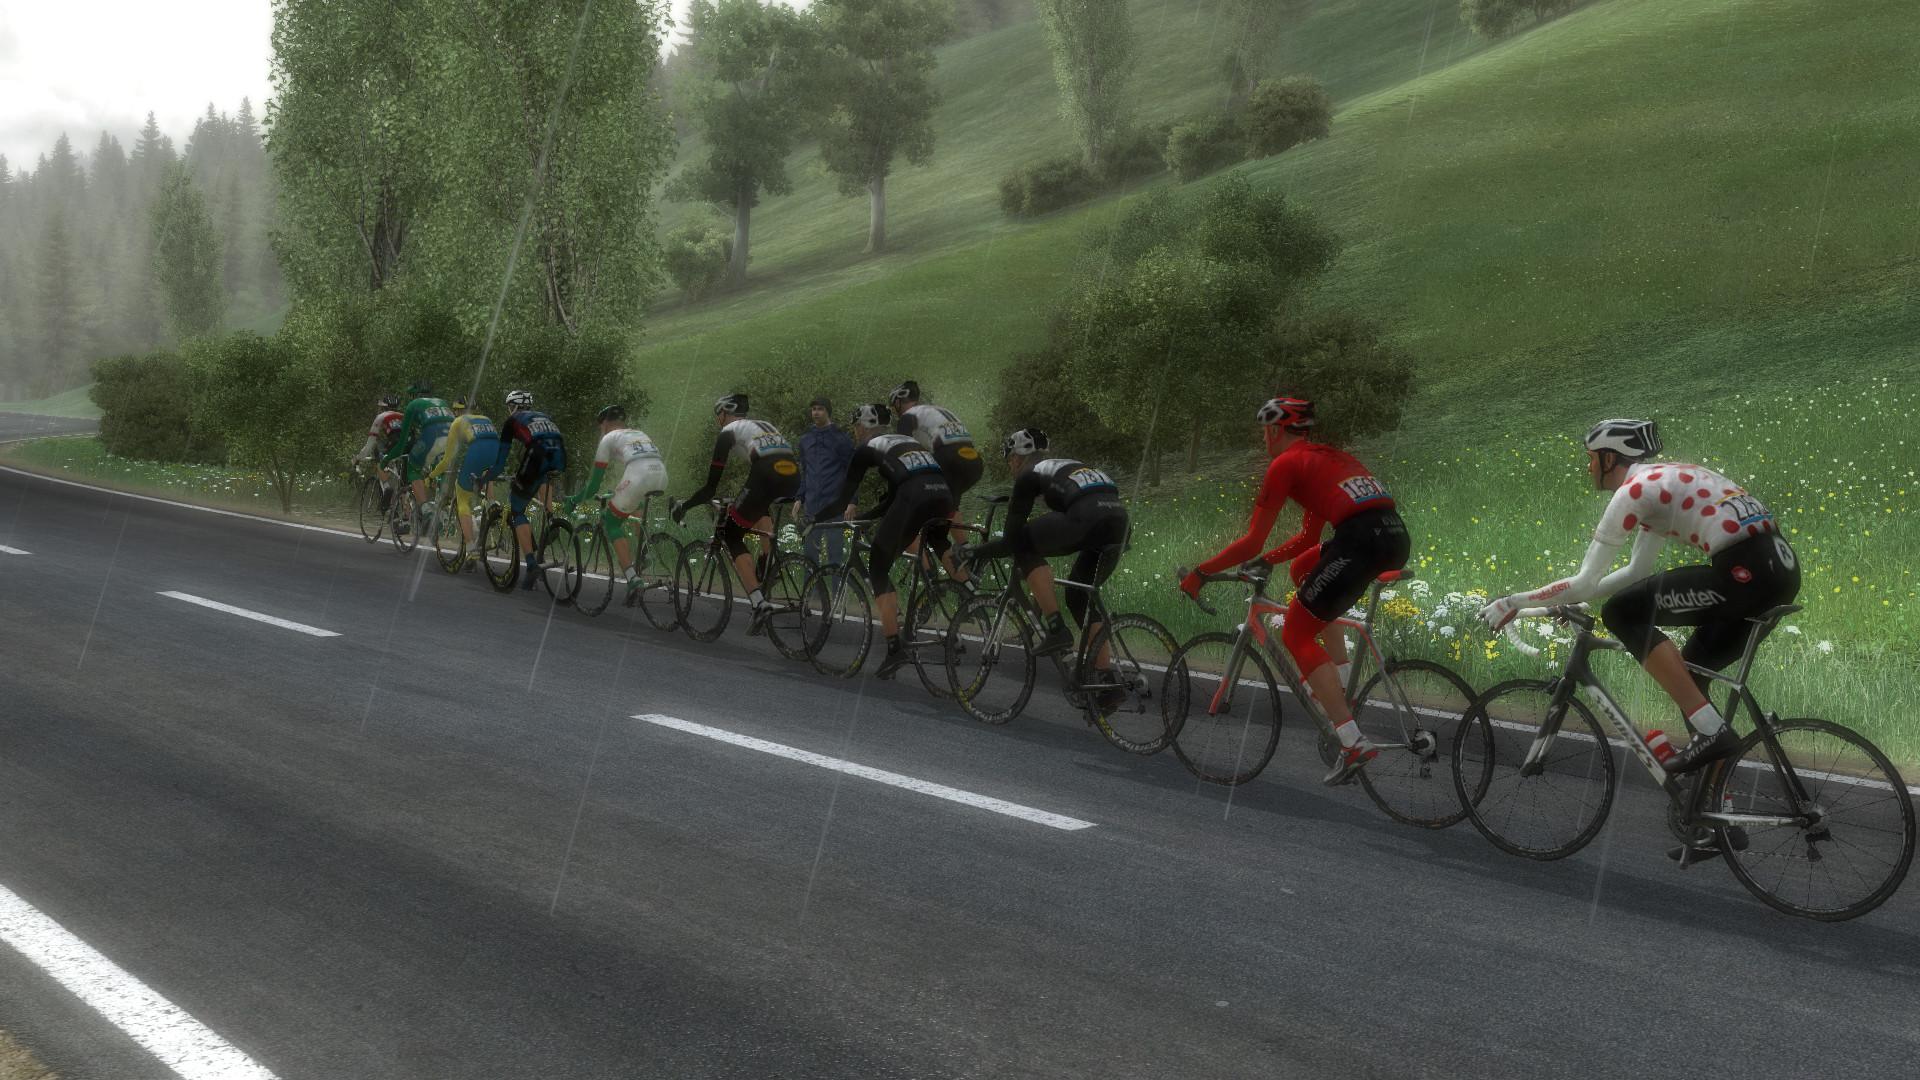 pcmdaily.com/images/mg/2019/Races/PTHC/Pologne/E5/04.jpg